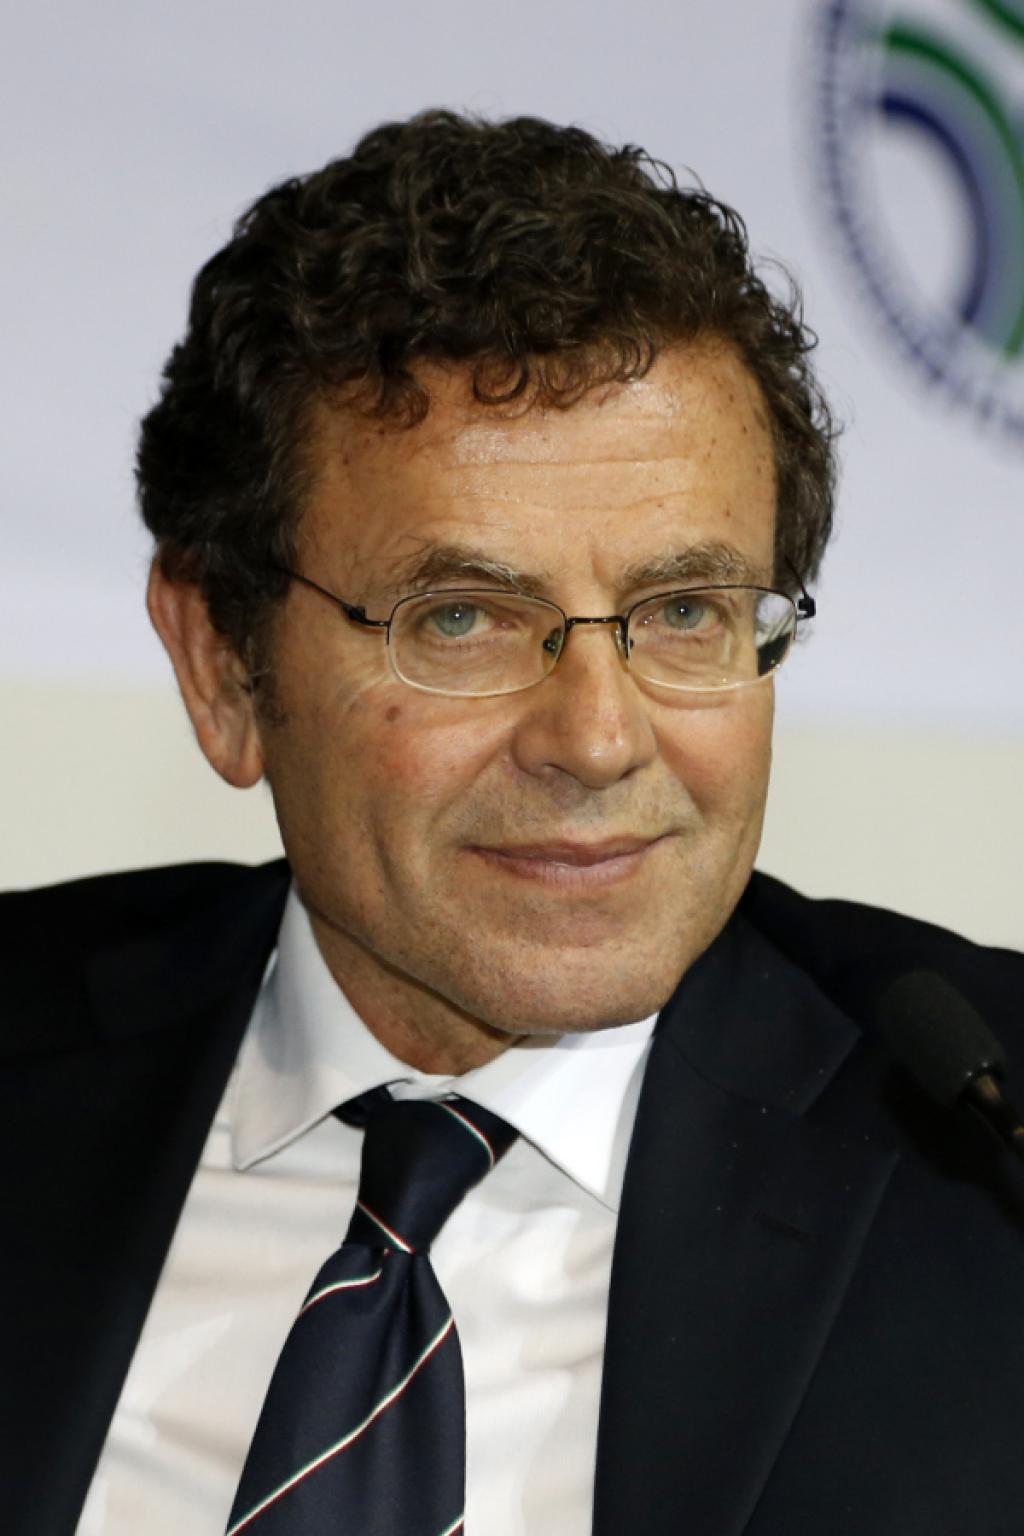 Italian Judo Federation elects Domenico Falcone as President